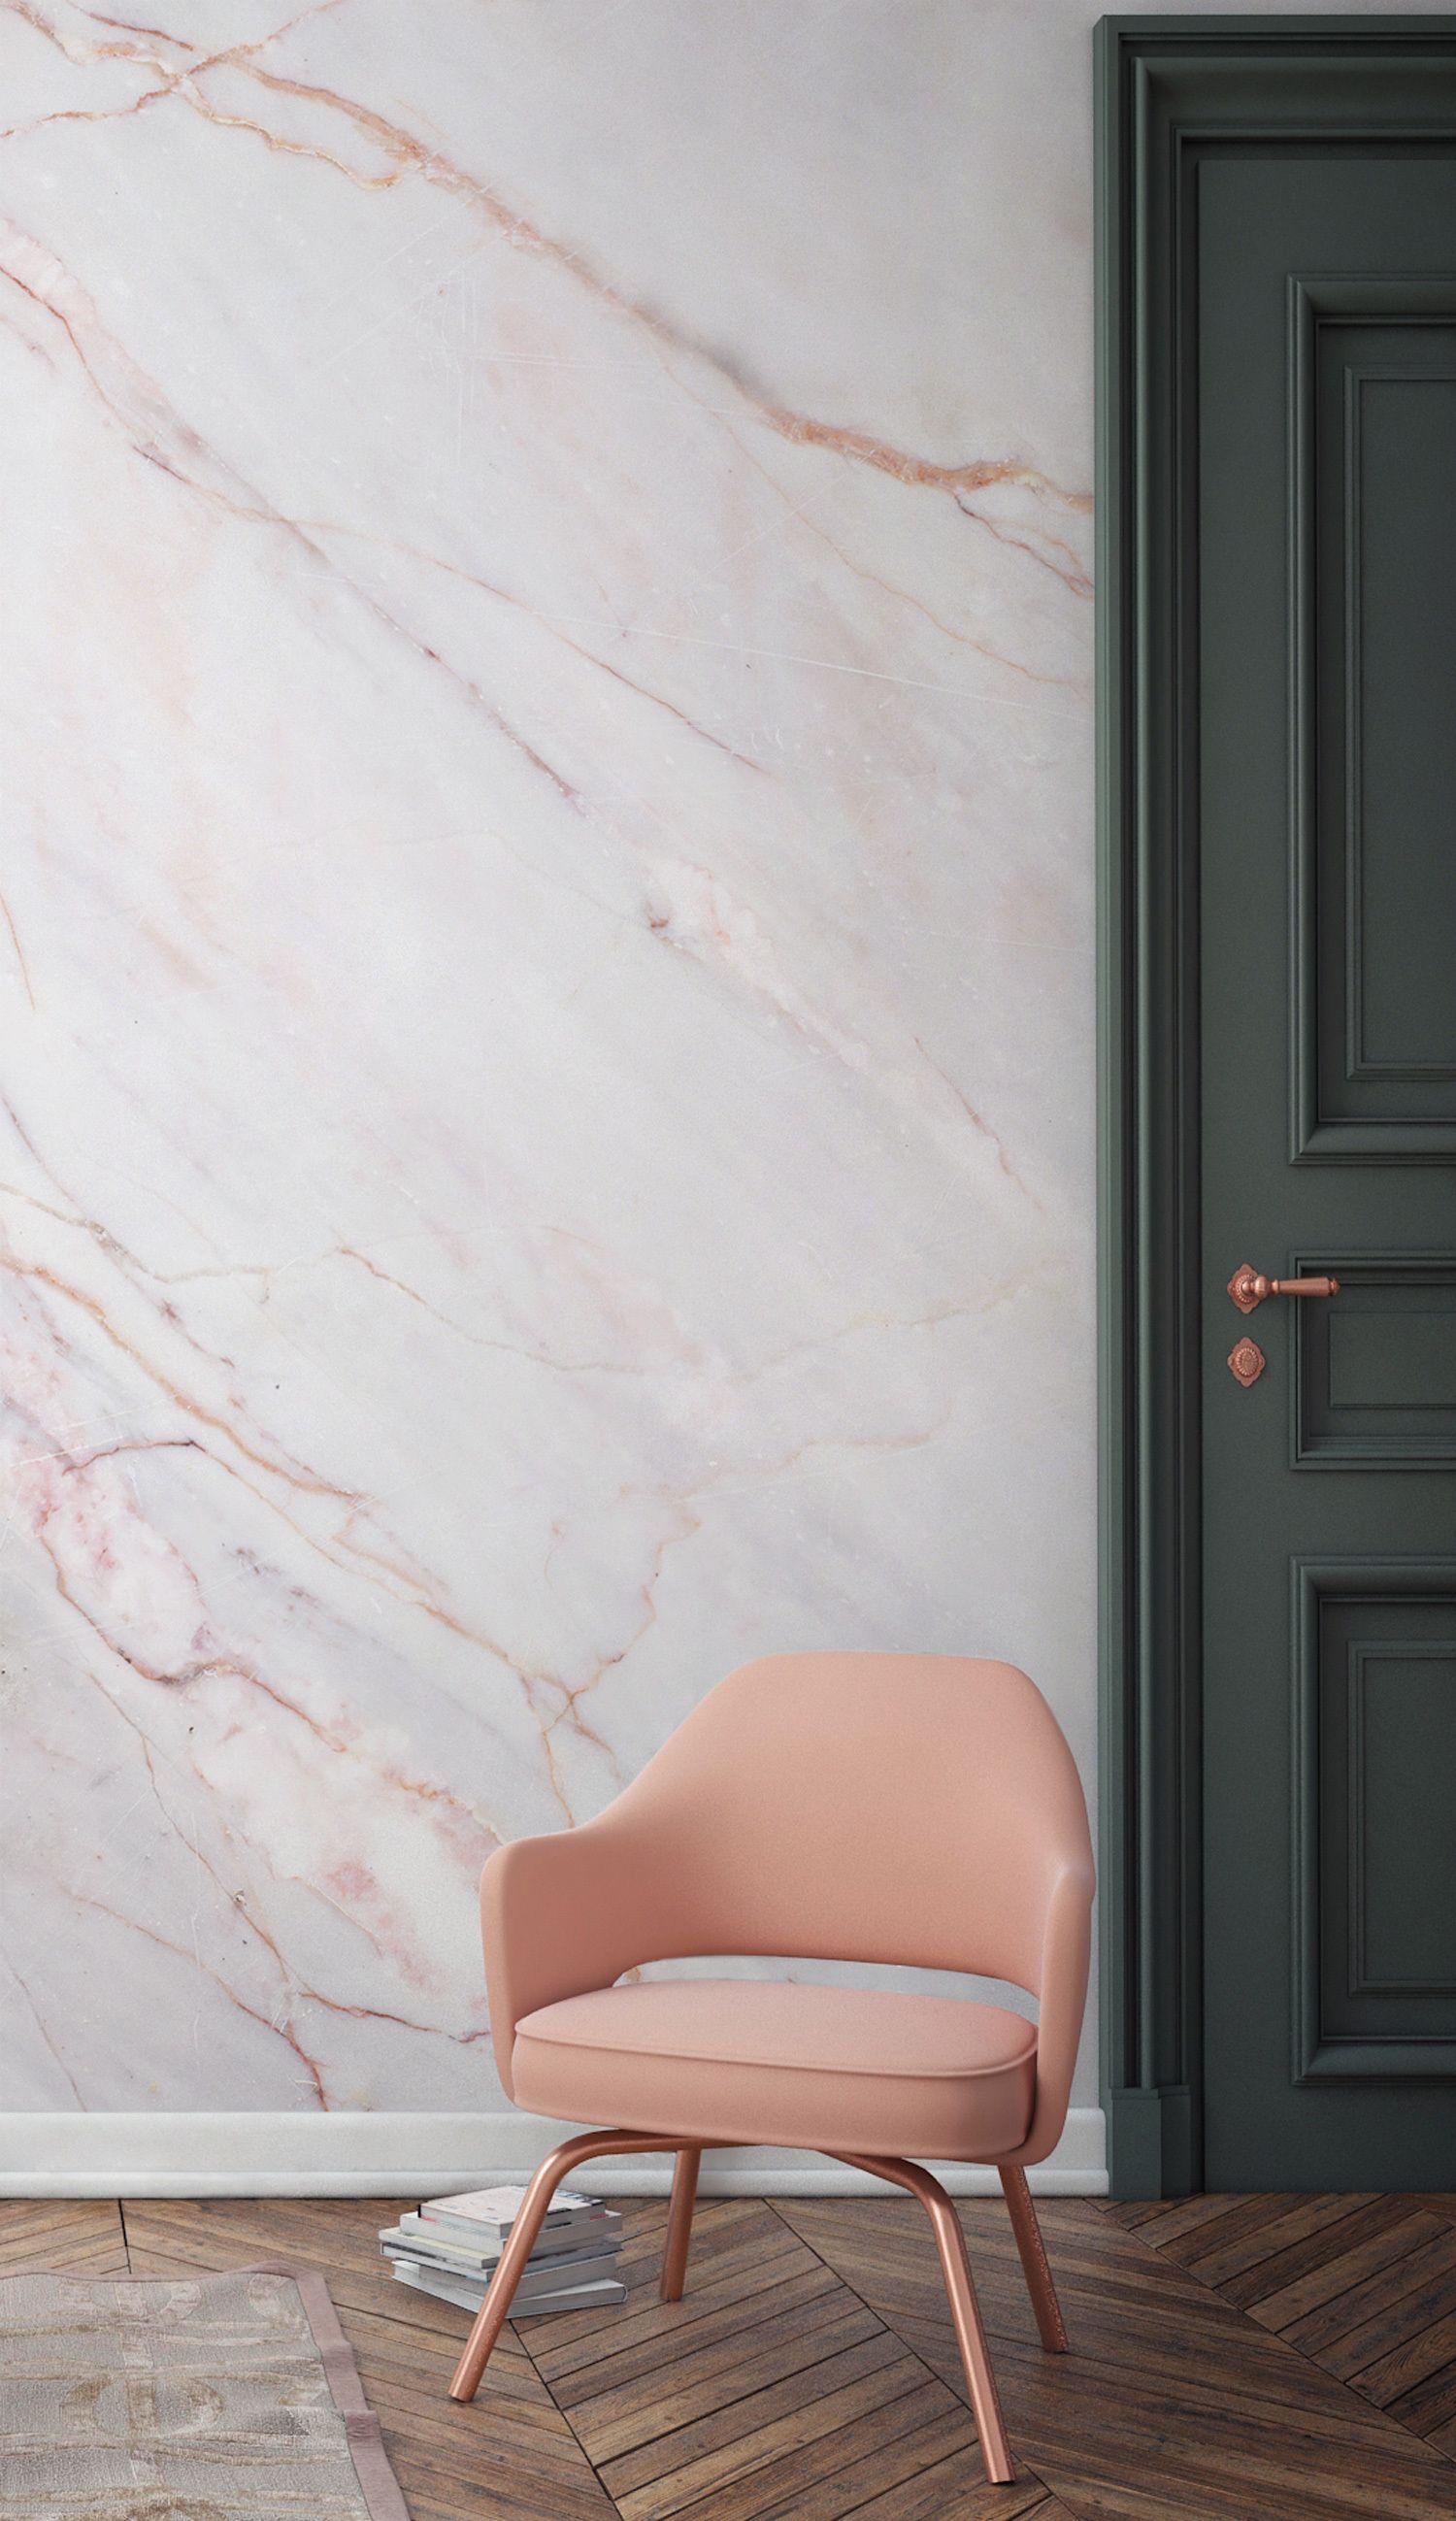 Download Wallpaper Marble Wood - 62eb092f22c4c60616f51dc067b589a0  Graphic_35270.jpg